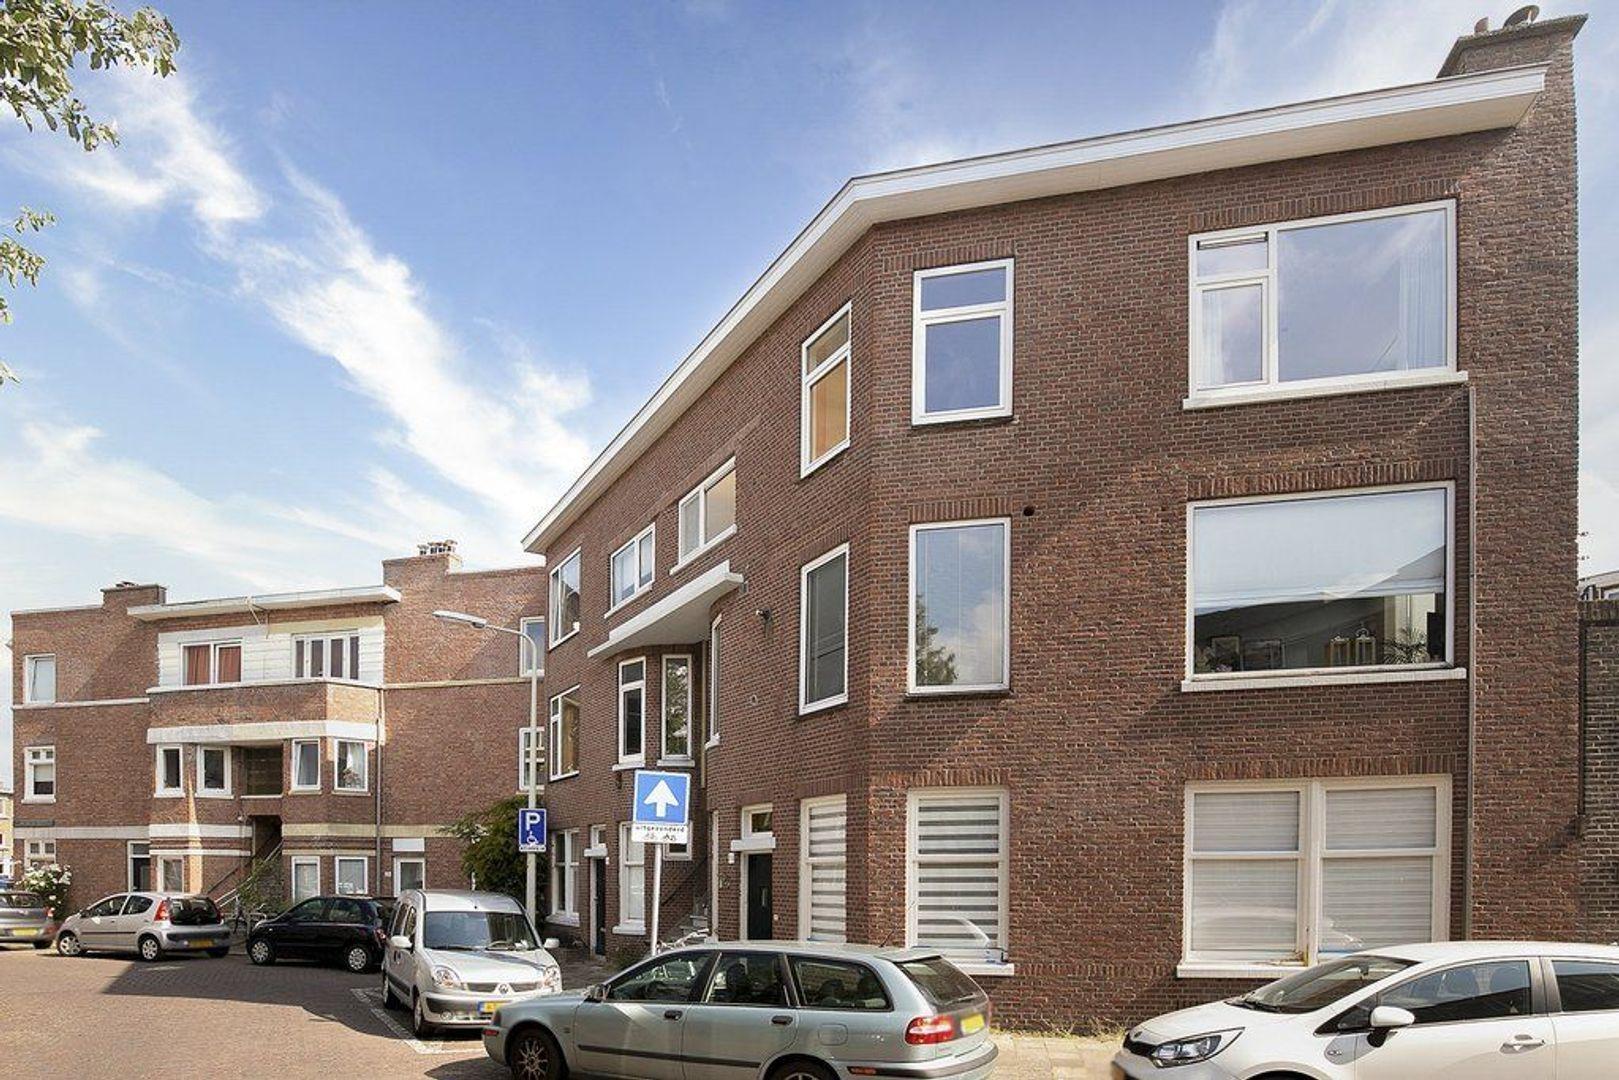 3e Joan Maetsuyckerstraat 228, Den Haag foto-21